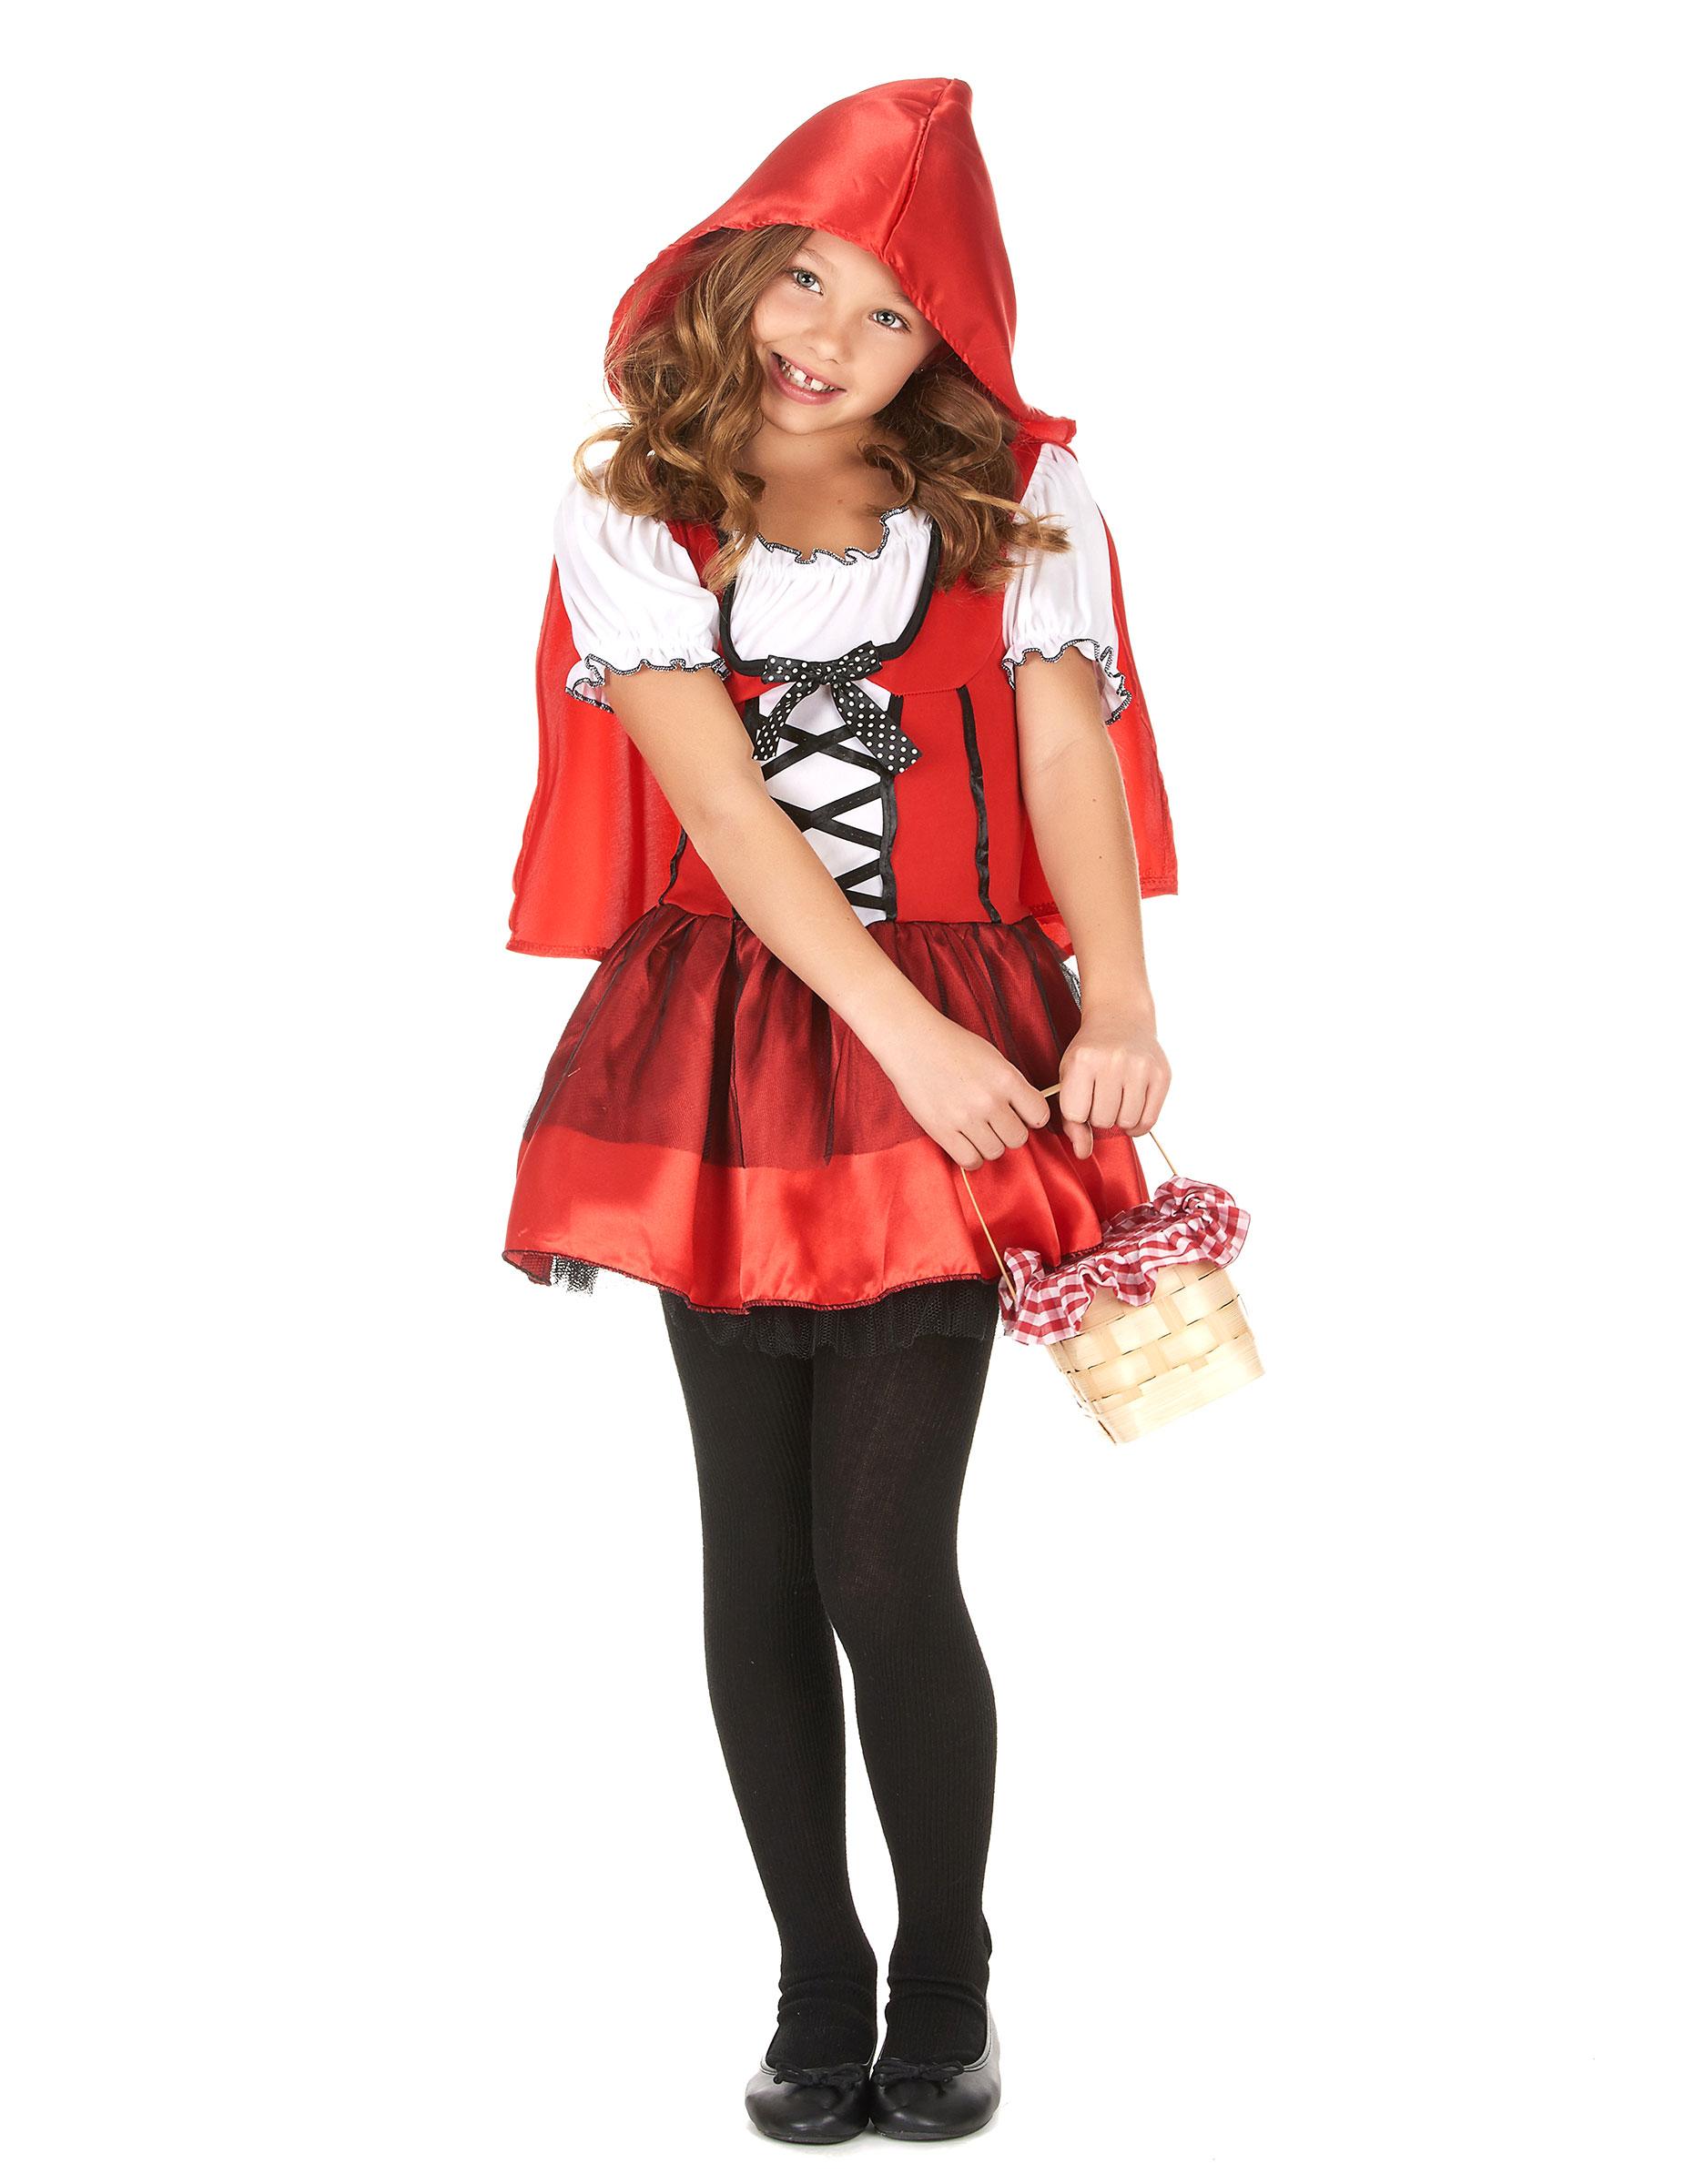 Kinderkostume Fur Madchen Ideen Fur Fasching Halloween